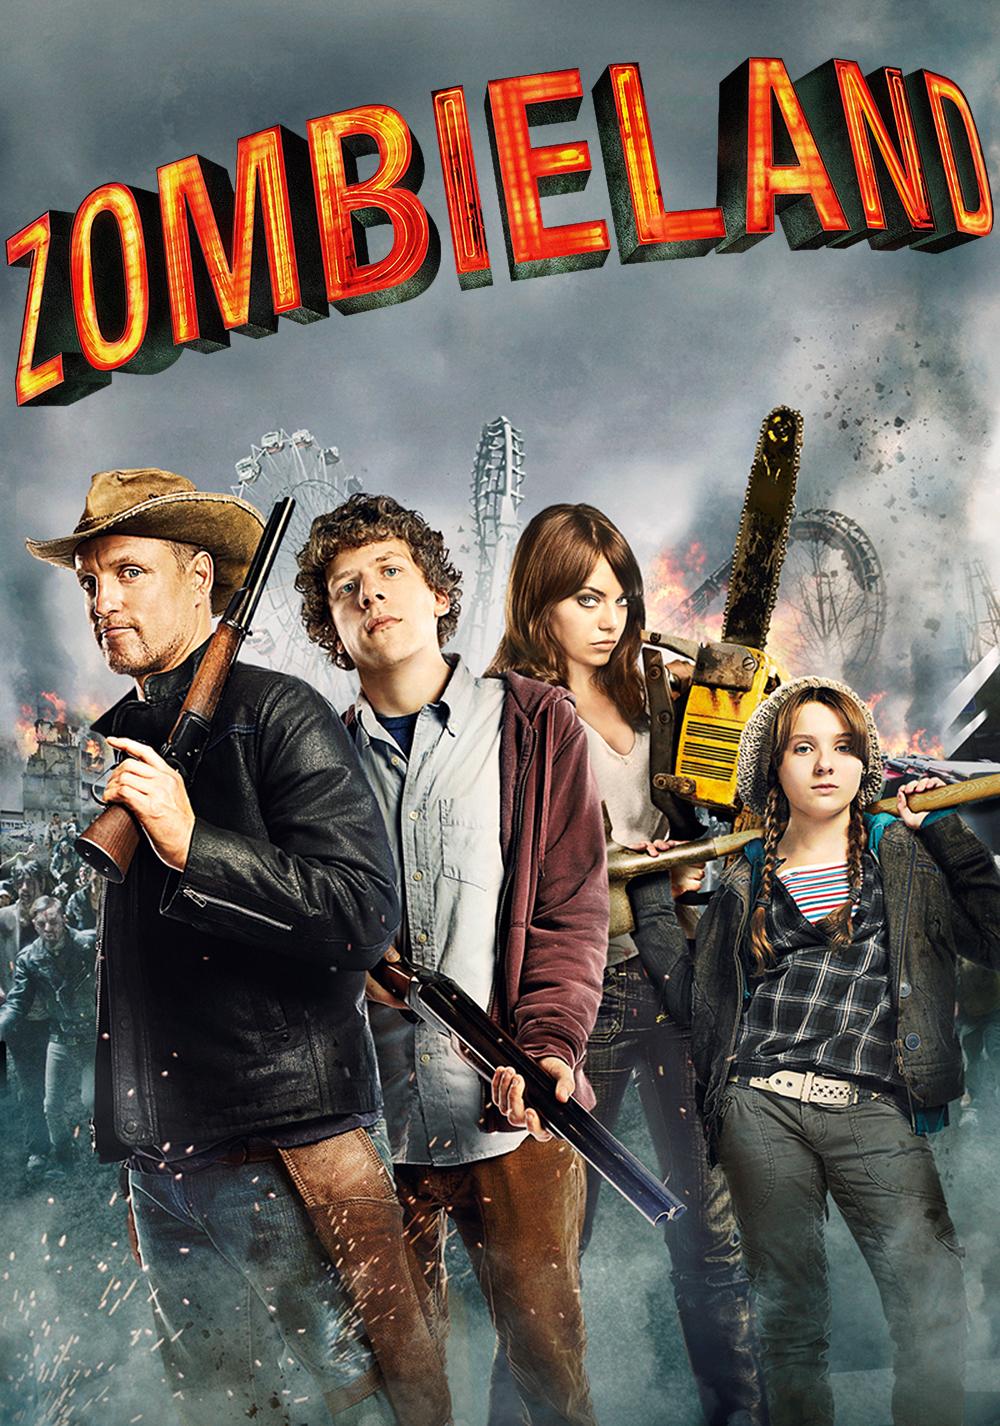 Zombieland | Movie fanart | fanart.tv